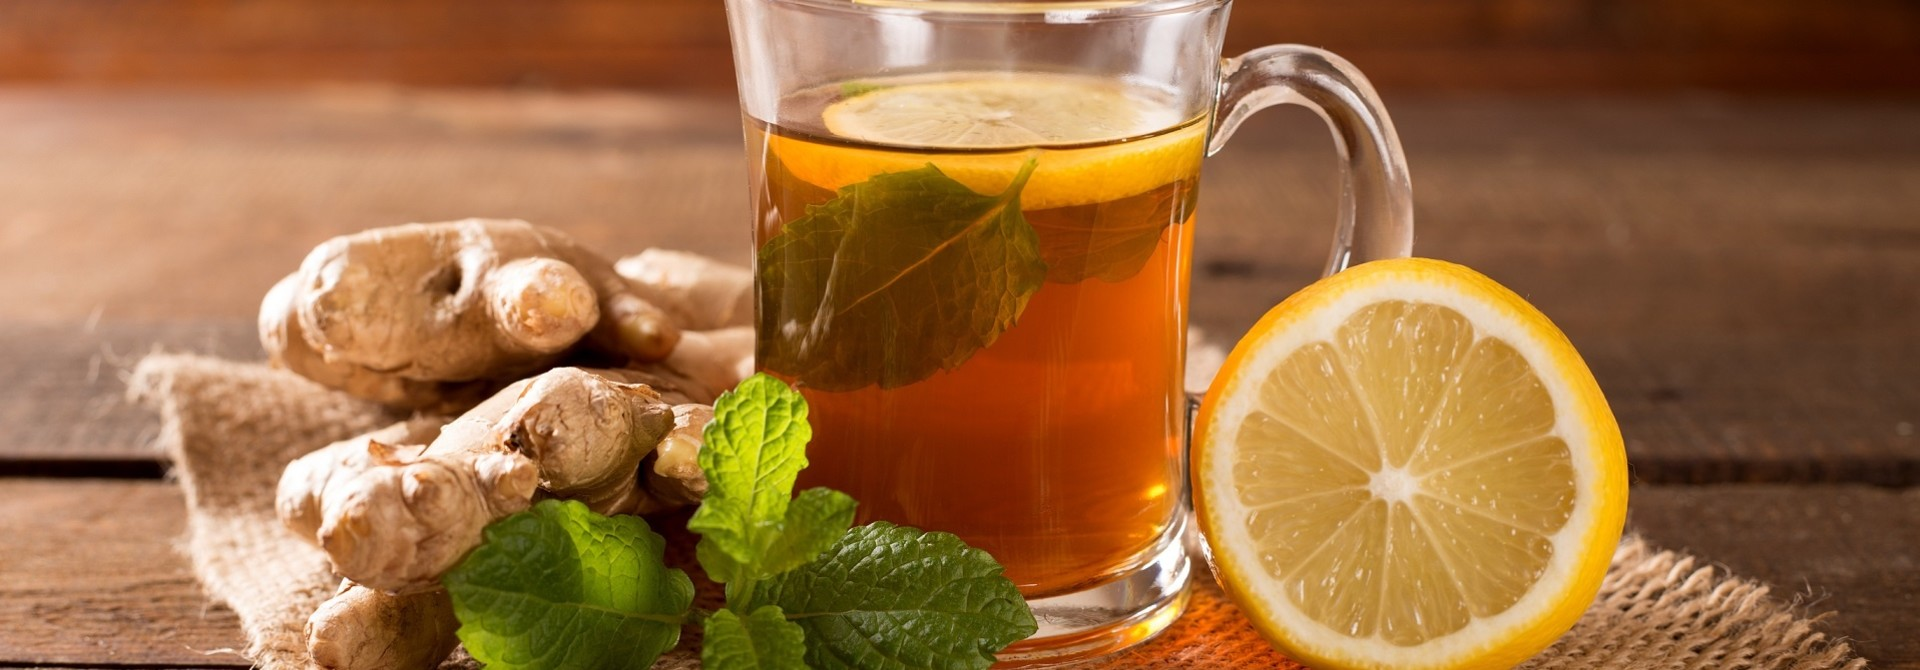 Oolong thee gearomatiseerd